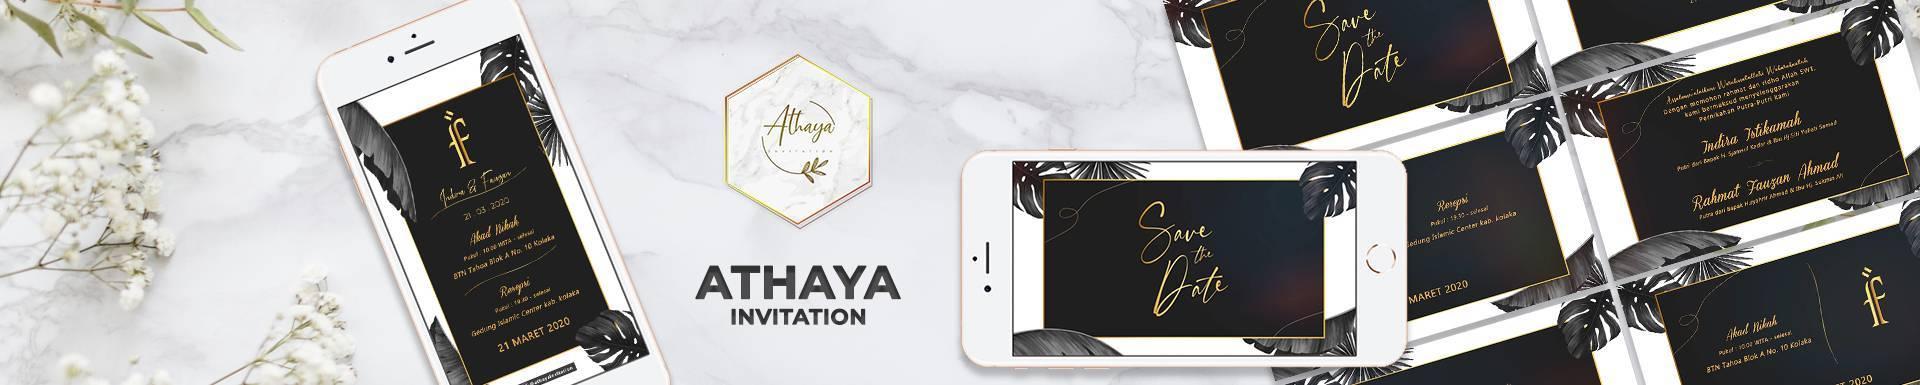 Athaya Invitation